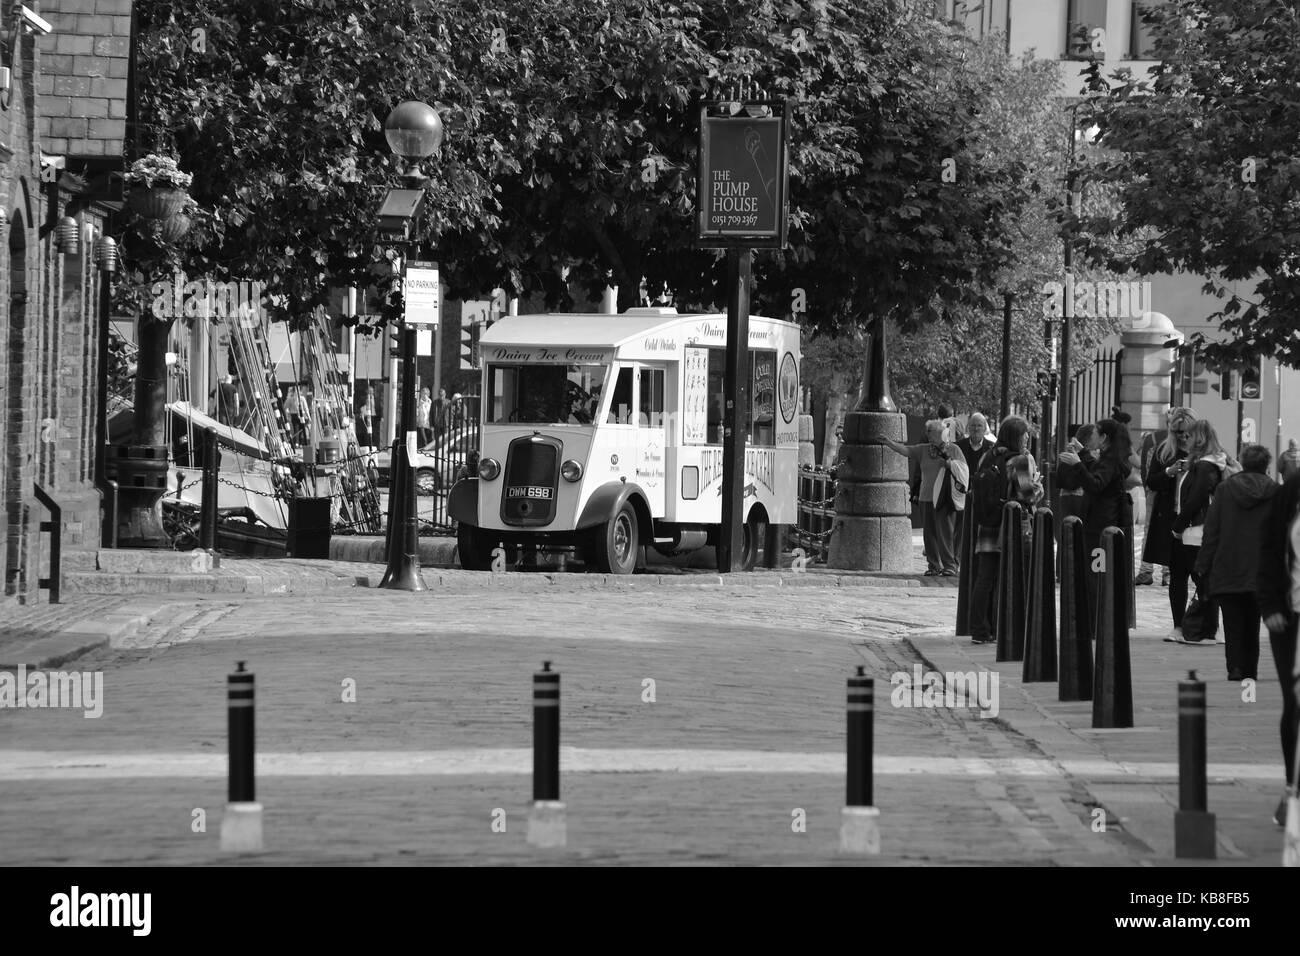 Photo's around Liverpool - Stock Image